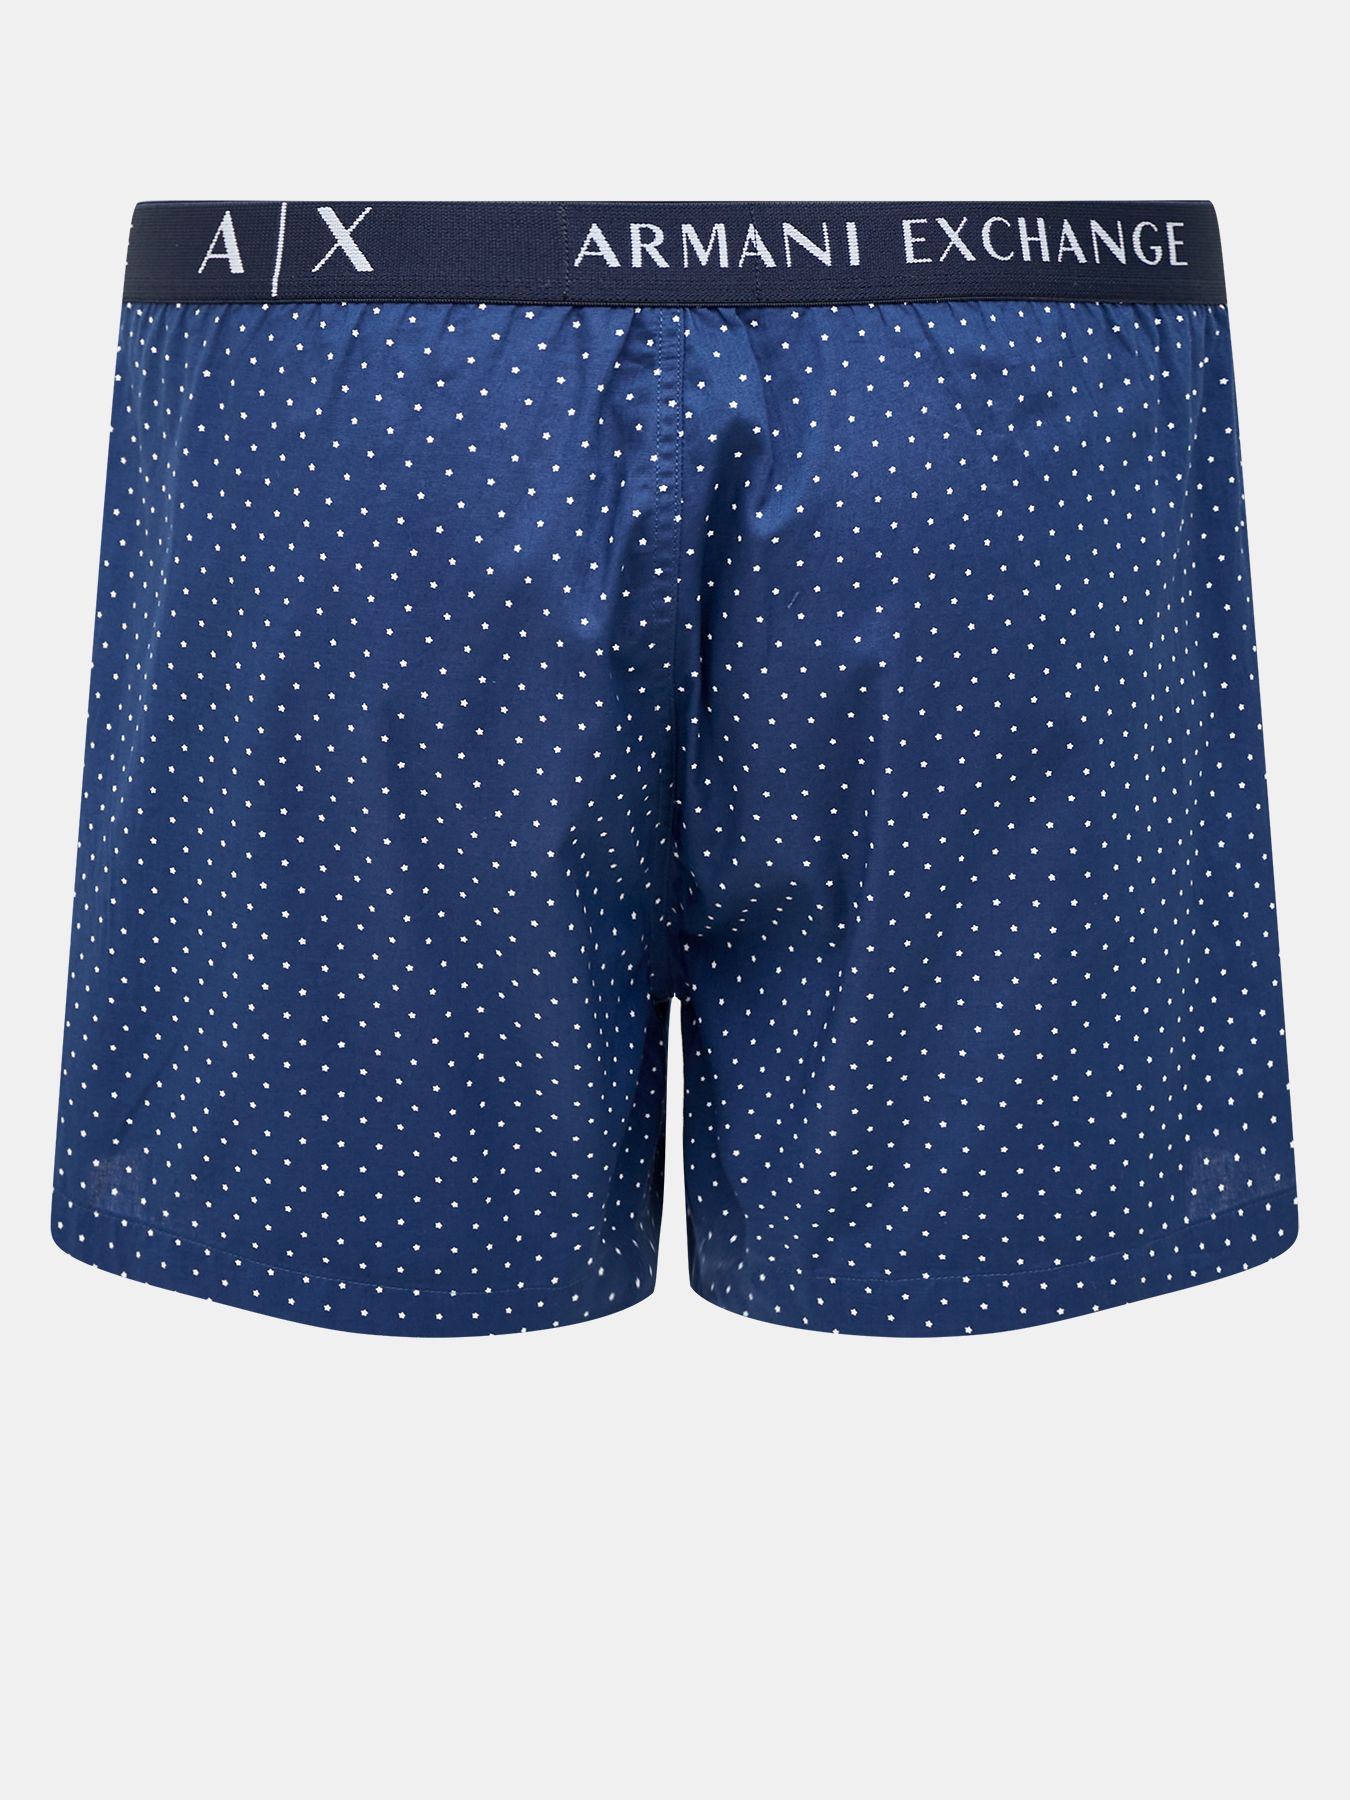 Трусы Armani Exchange Трусы-шорты трусы tezenis tezenis mp002xw01iw3